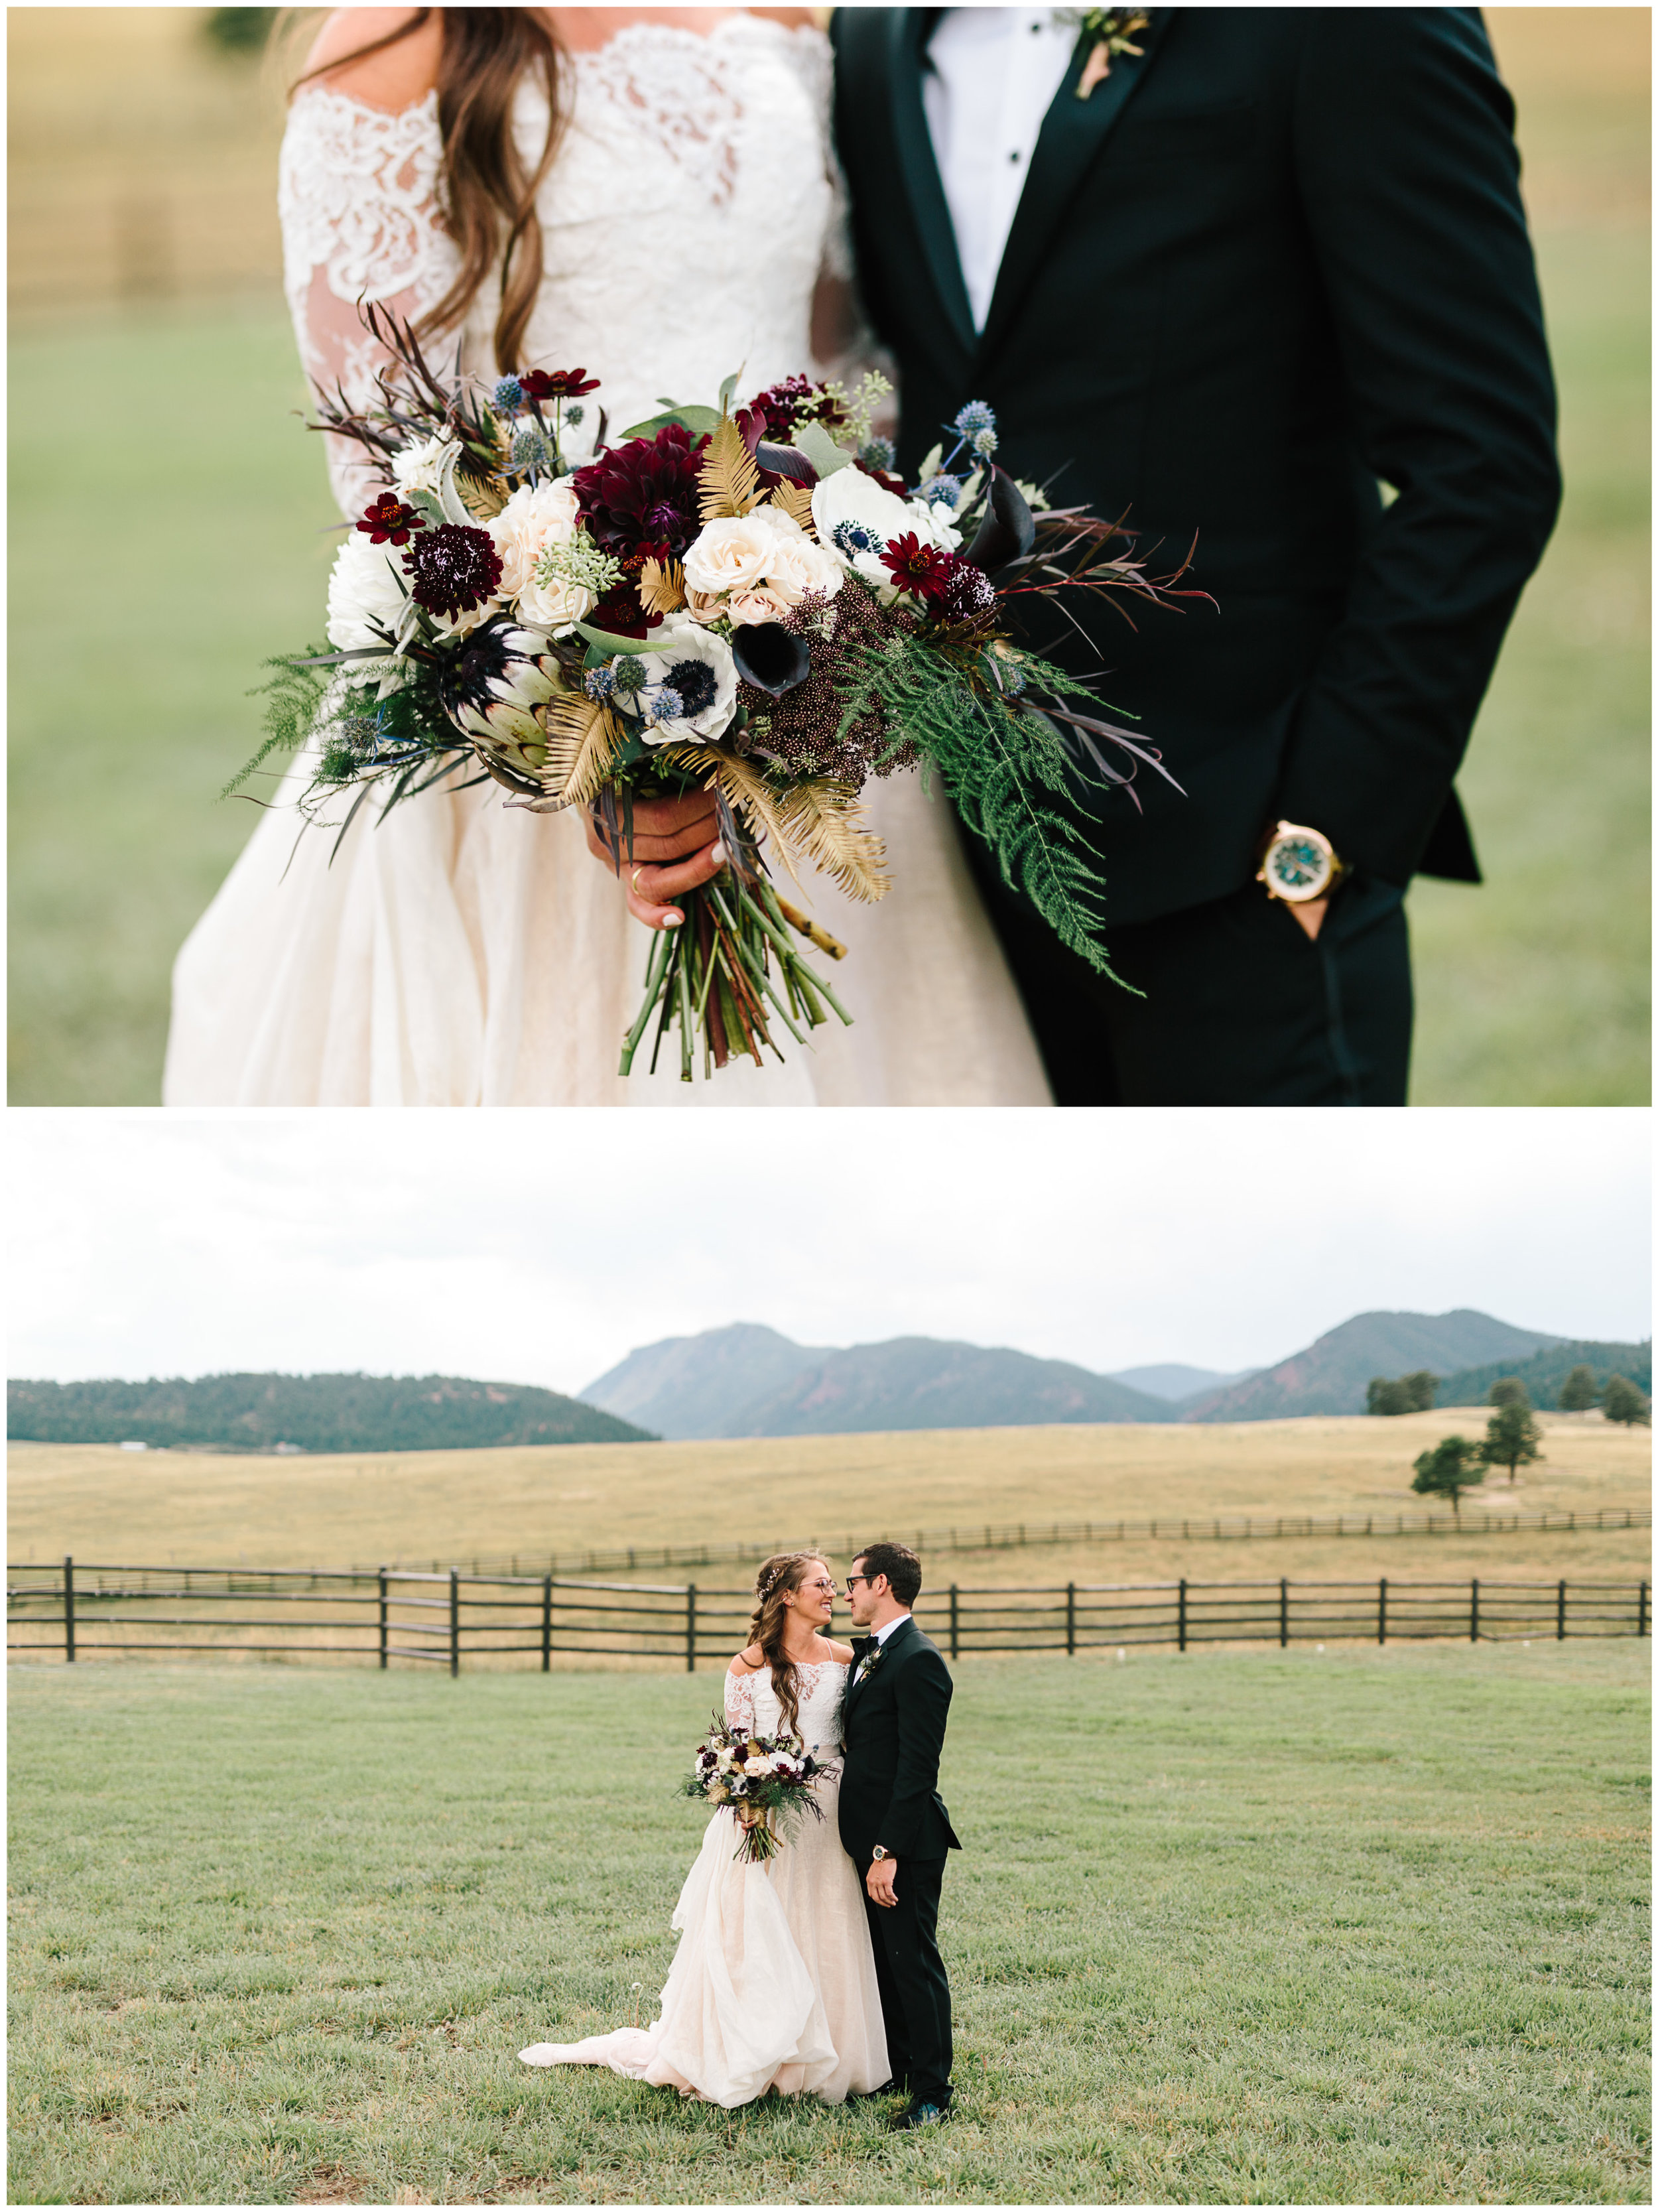 spruce_mountain_ranch_wedding_25.jpg